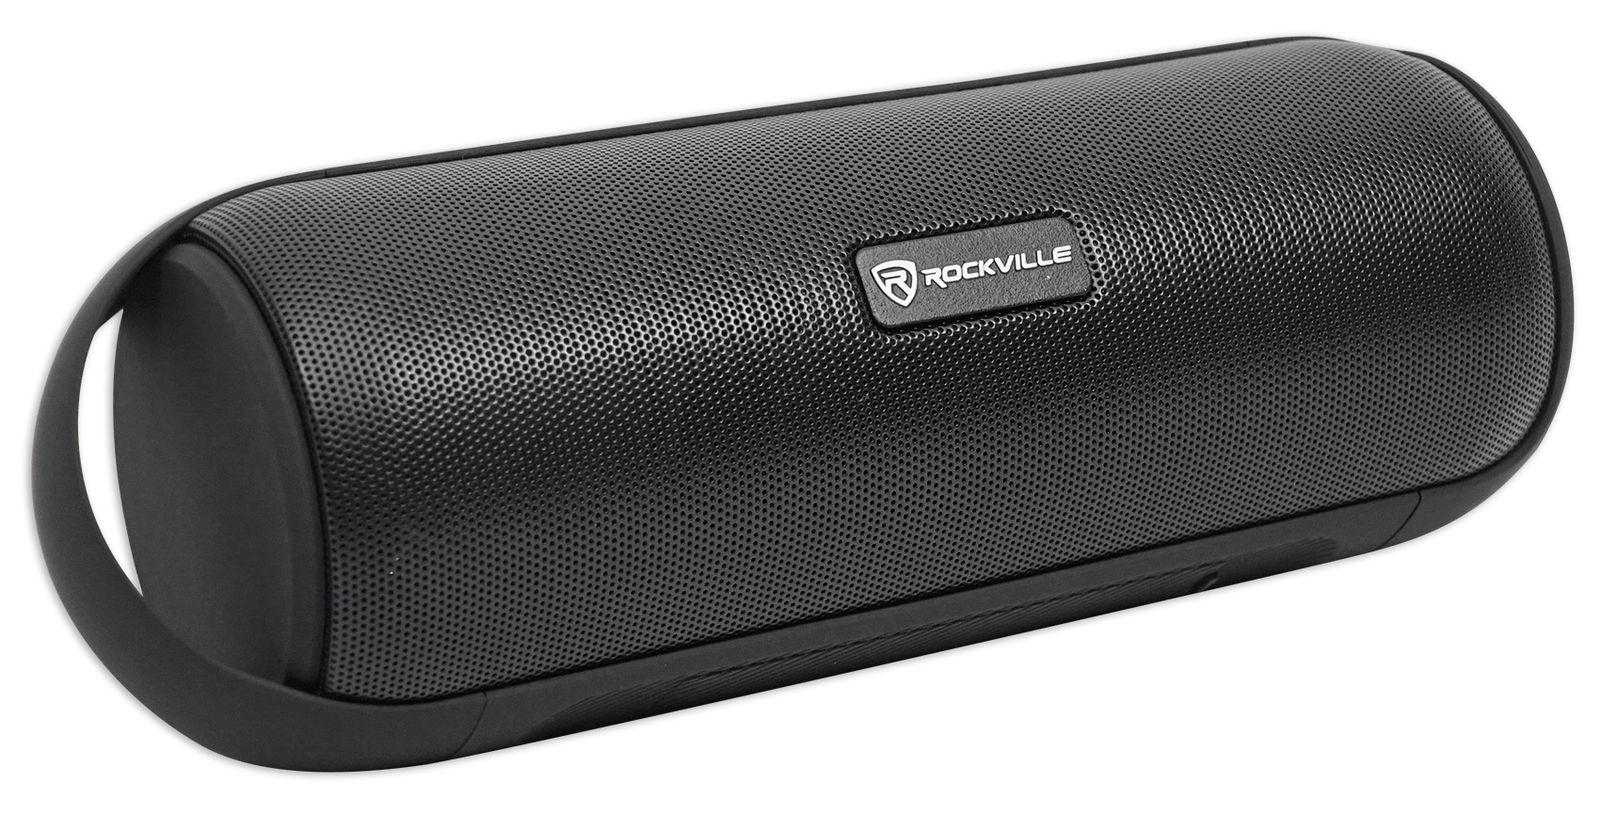 Only $30 Rockville RPB25 40 Watt Portable/Outdoor Bluetooth Speaker w/USB+SD+Aux In+FM